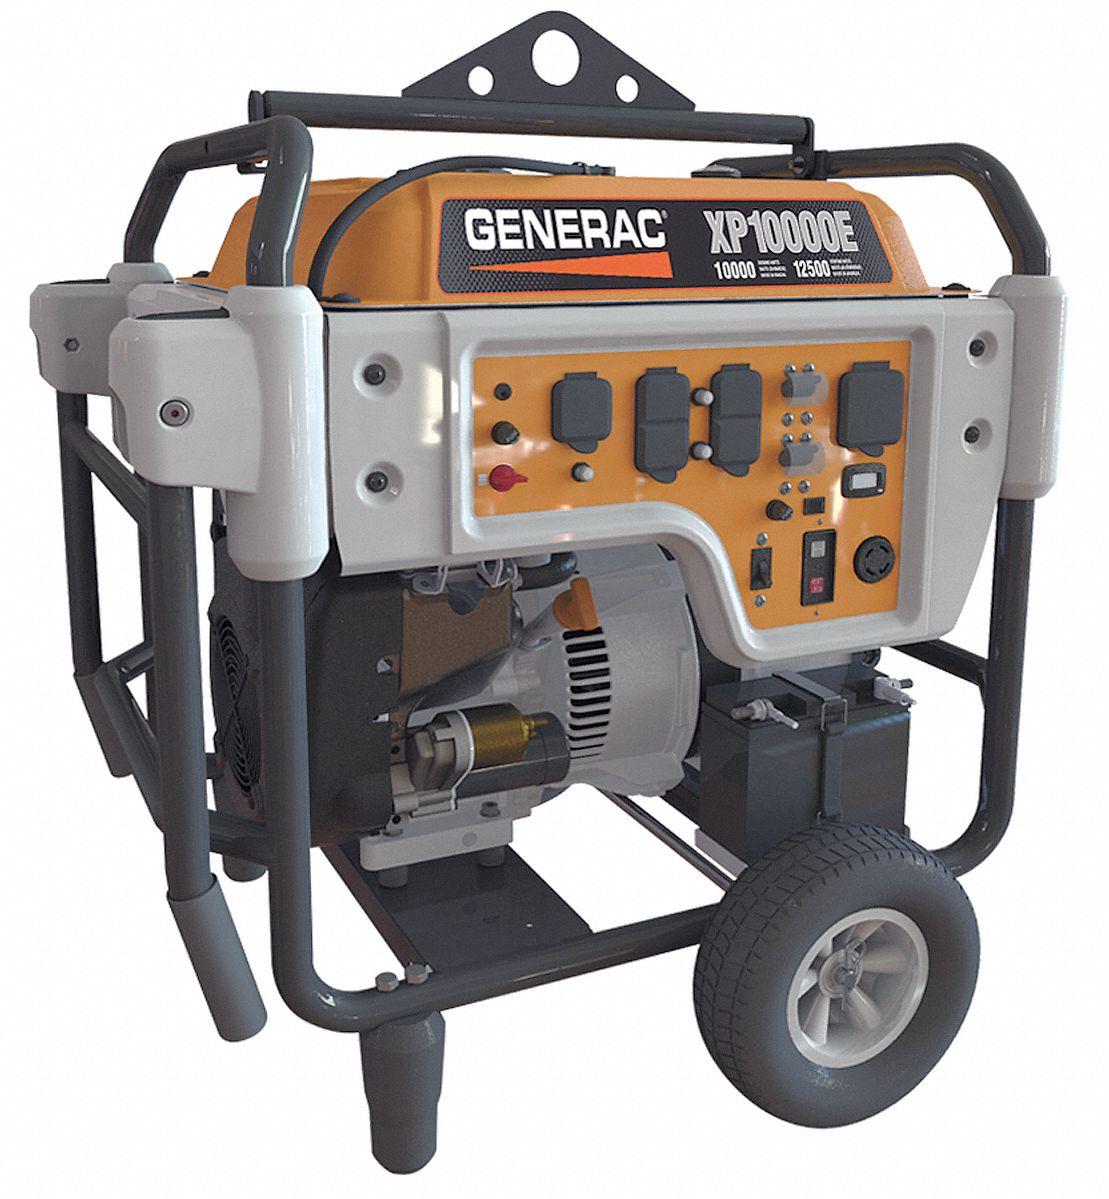 hight resolution of generac electric gasoline portable generator 10 000 rated watts 12 500 surge watts 120vac 240vac 6fdl7 5932 grainger